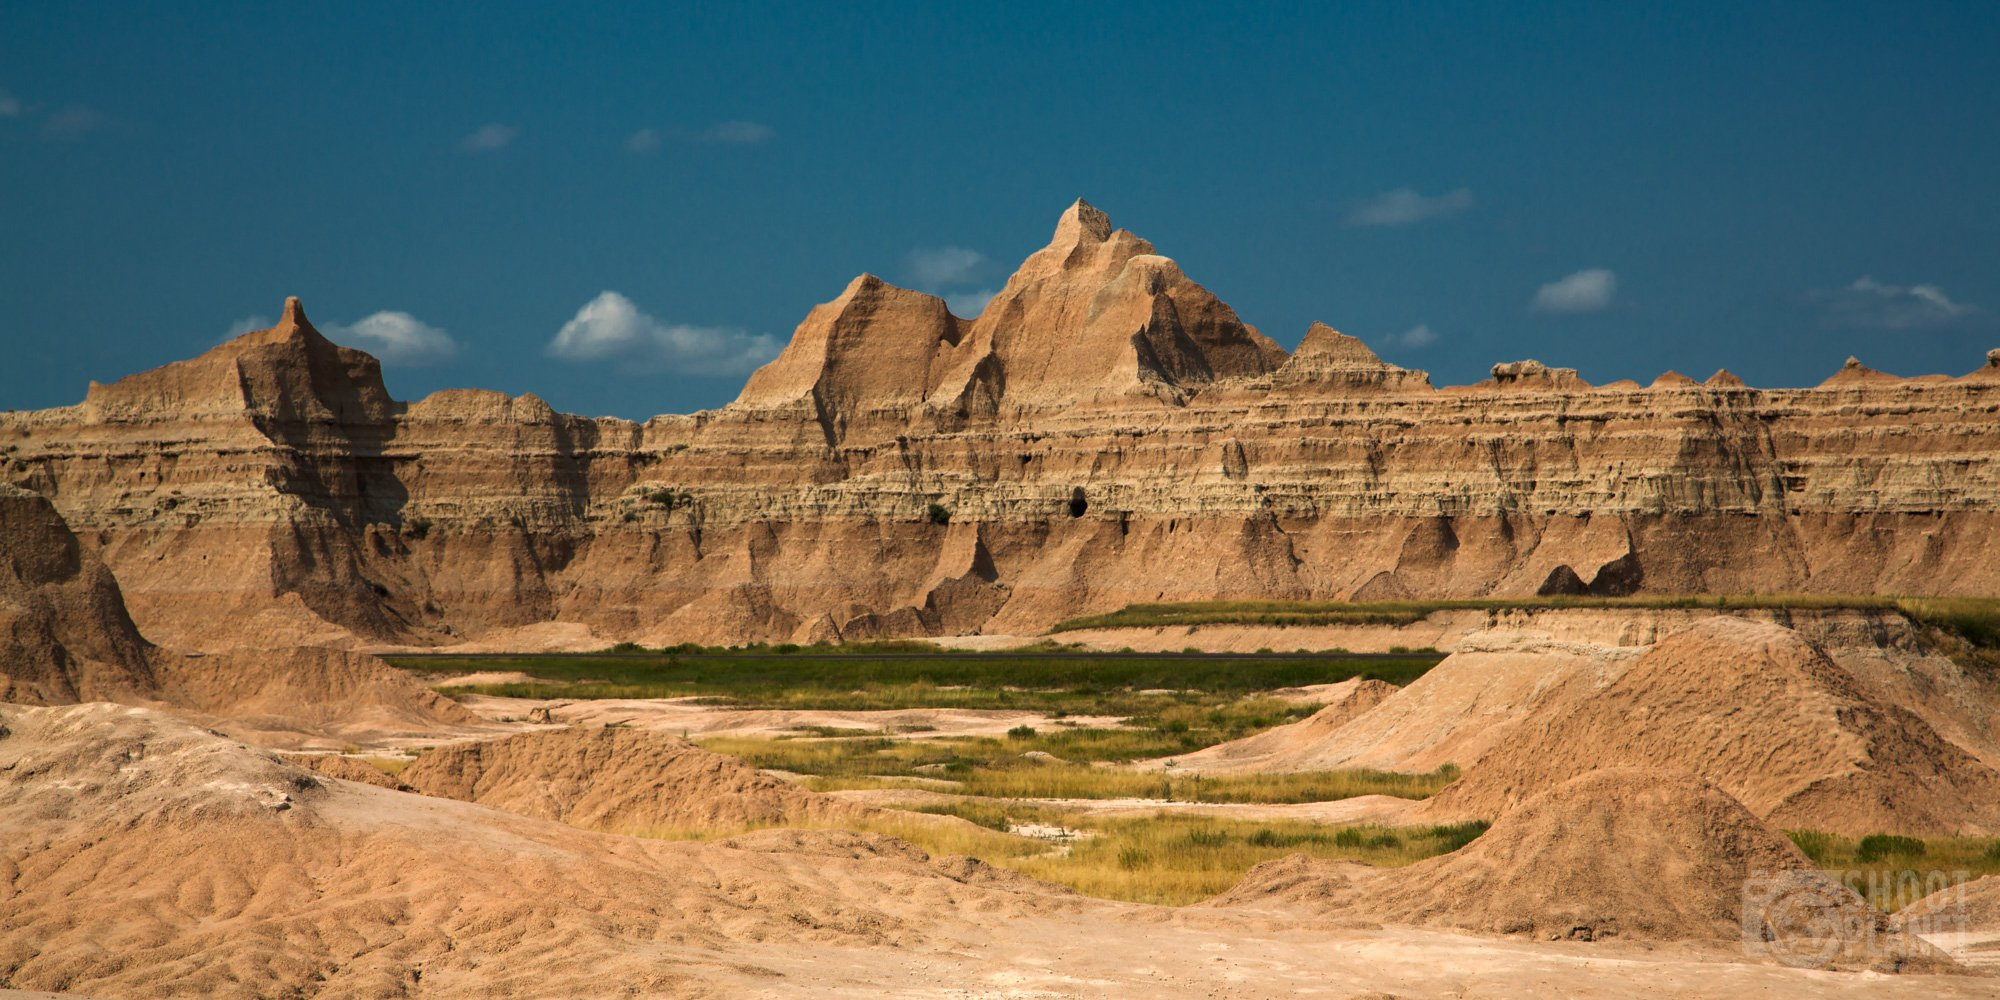 Badlands National Park mountains, South Dakota USA